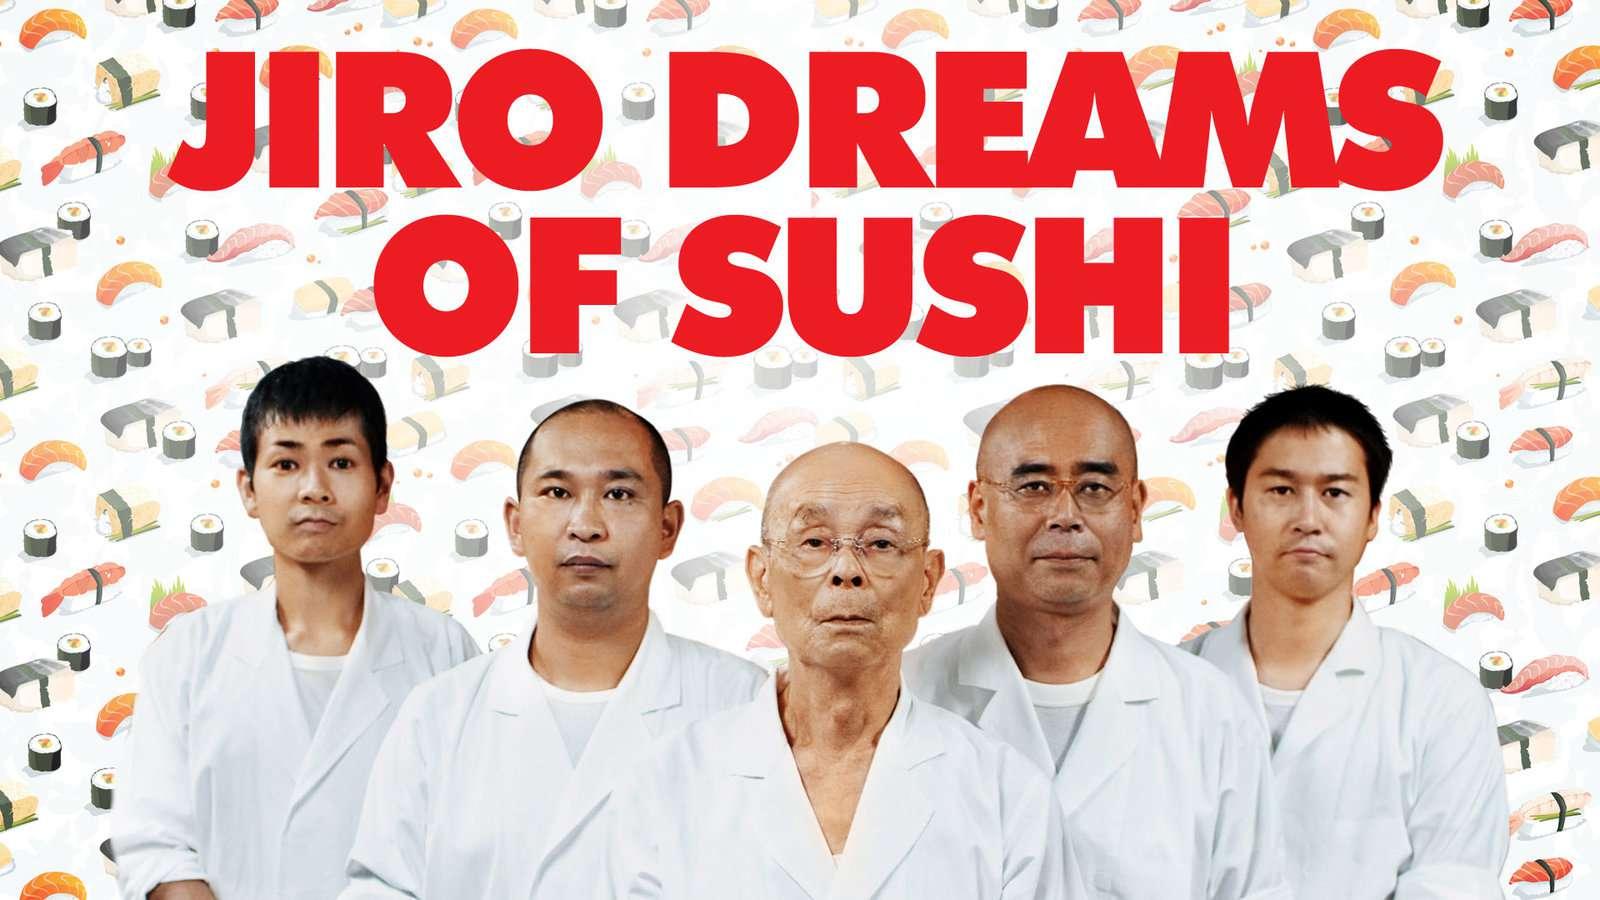 Jiro Dreams of Sushi documentary poster